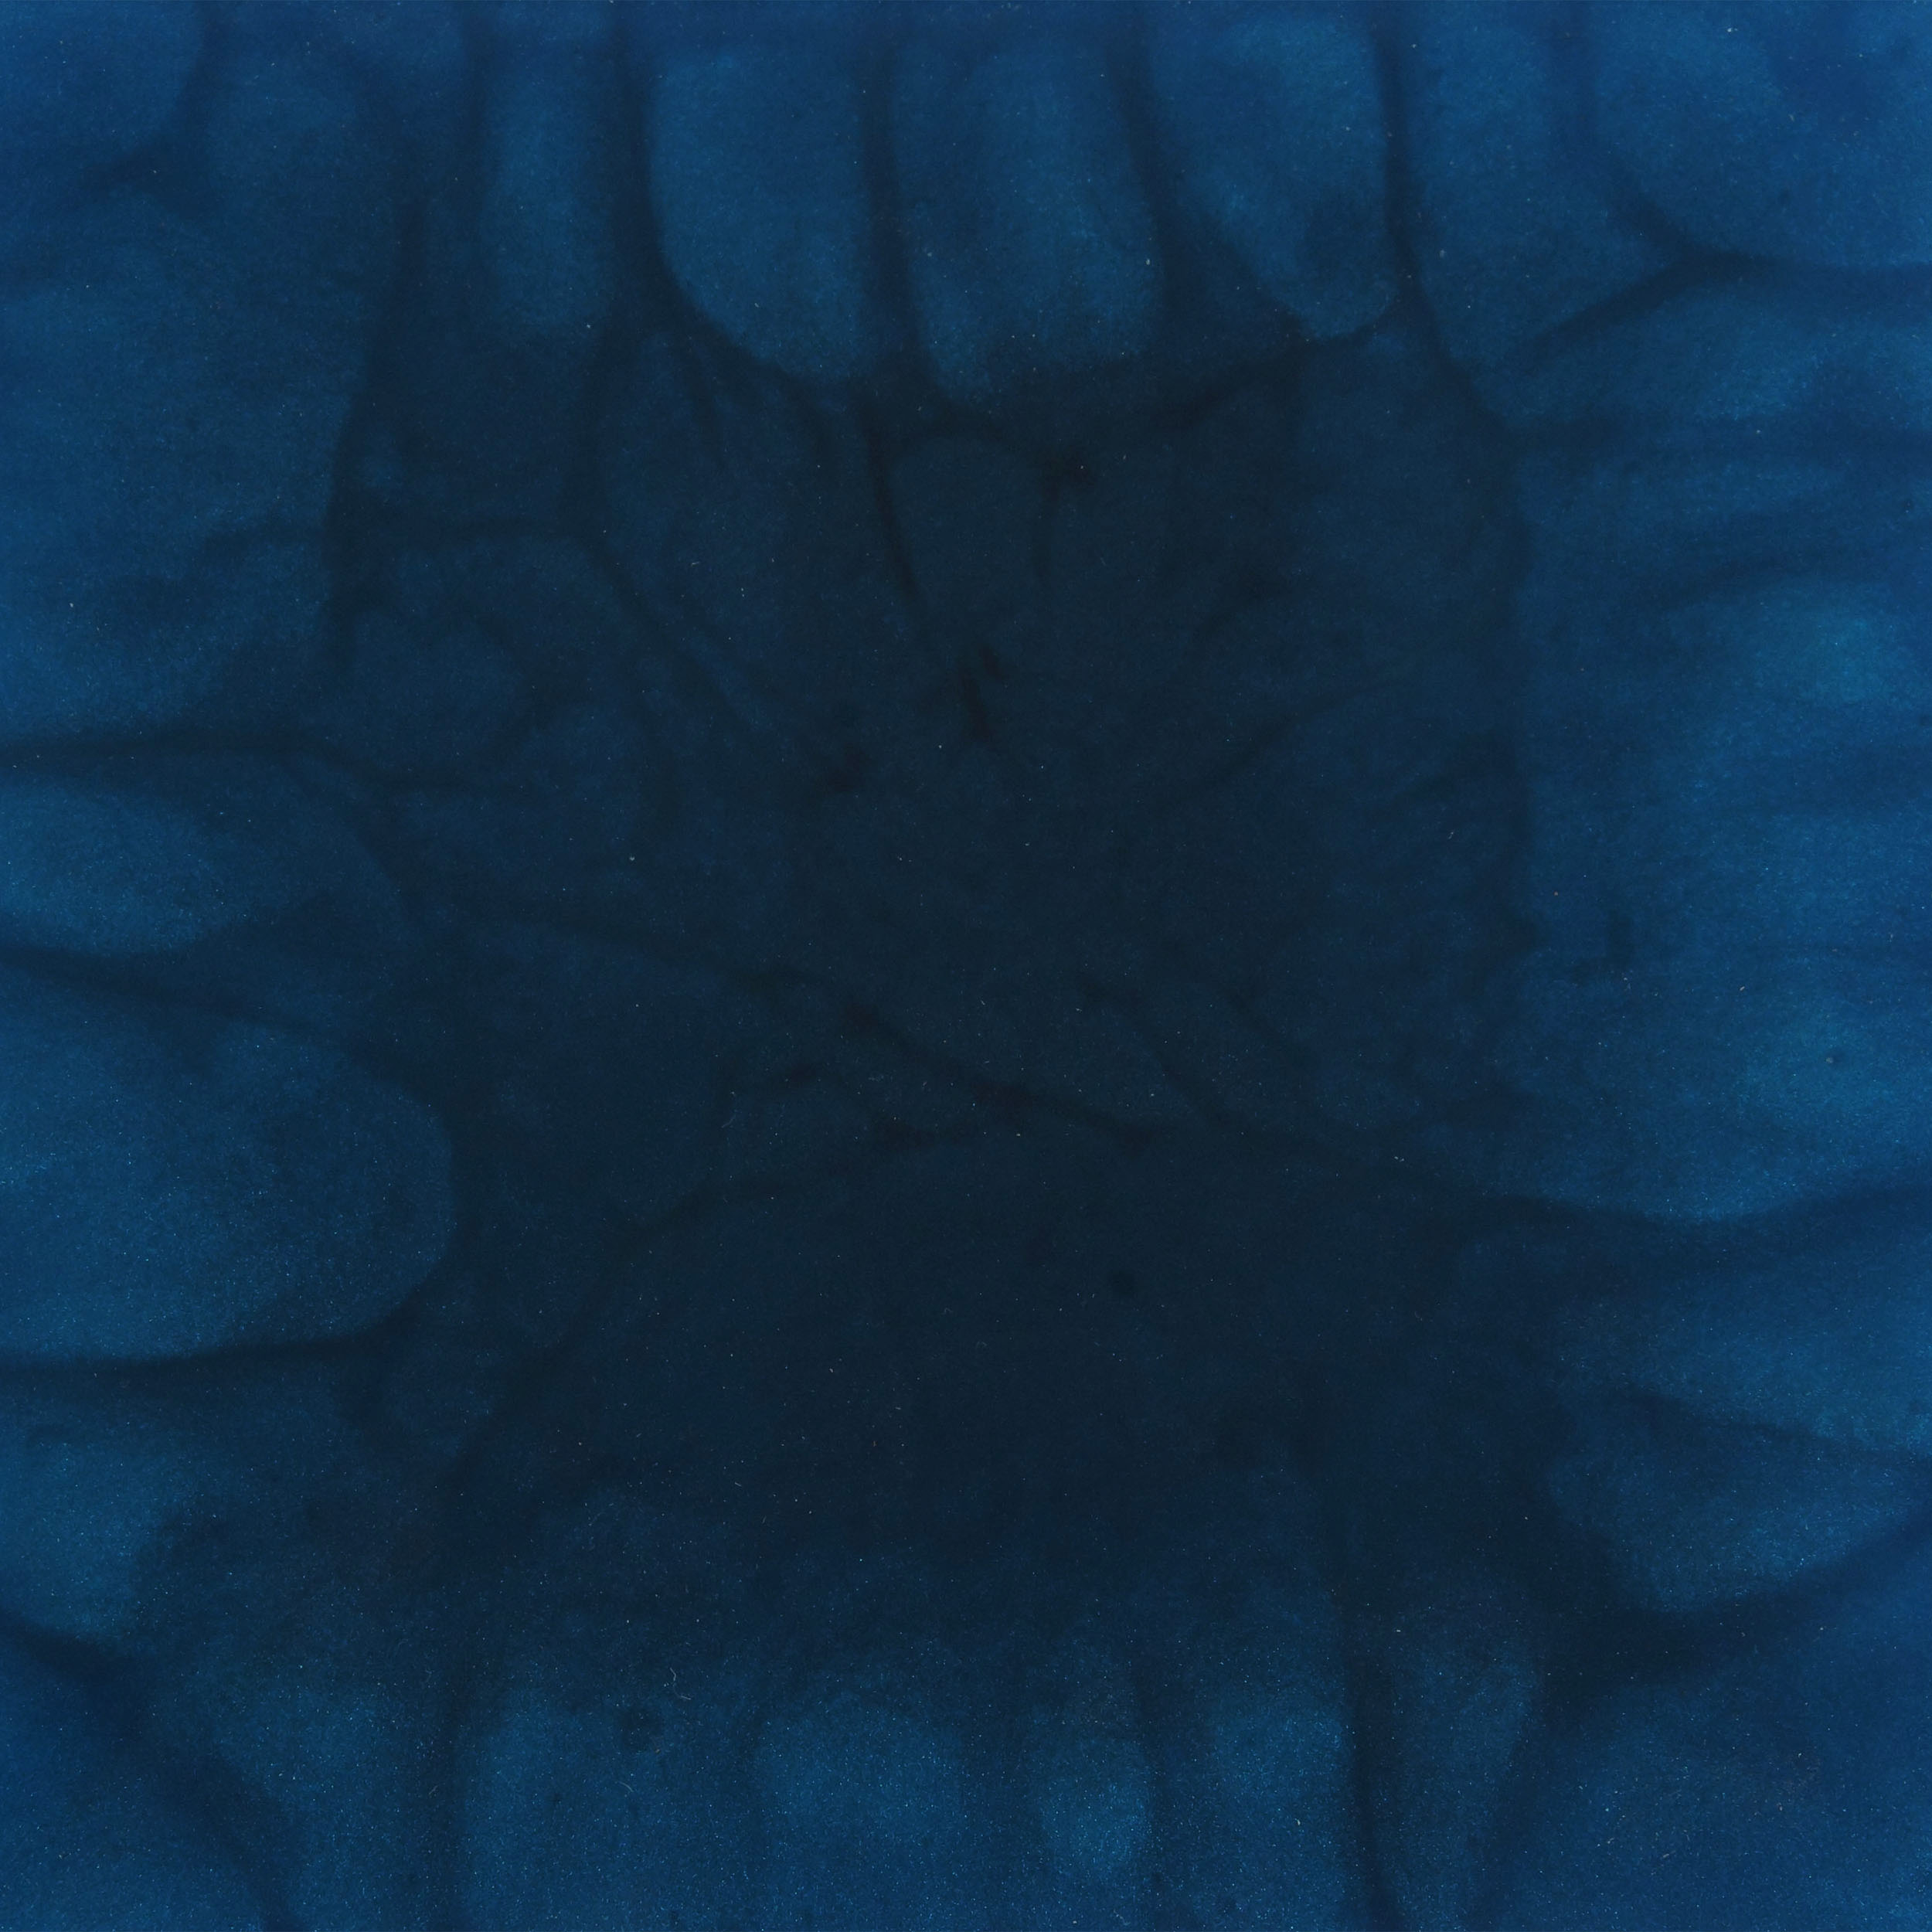 Deep Blue Sea Epoxy Resin Sample Color